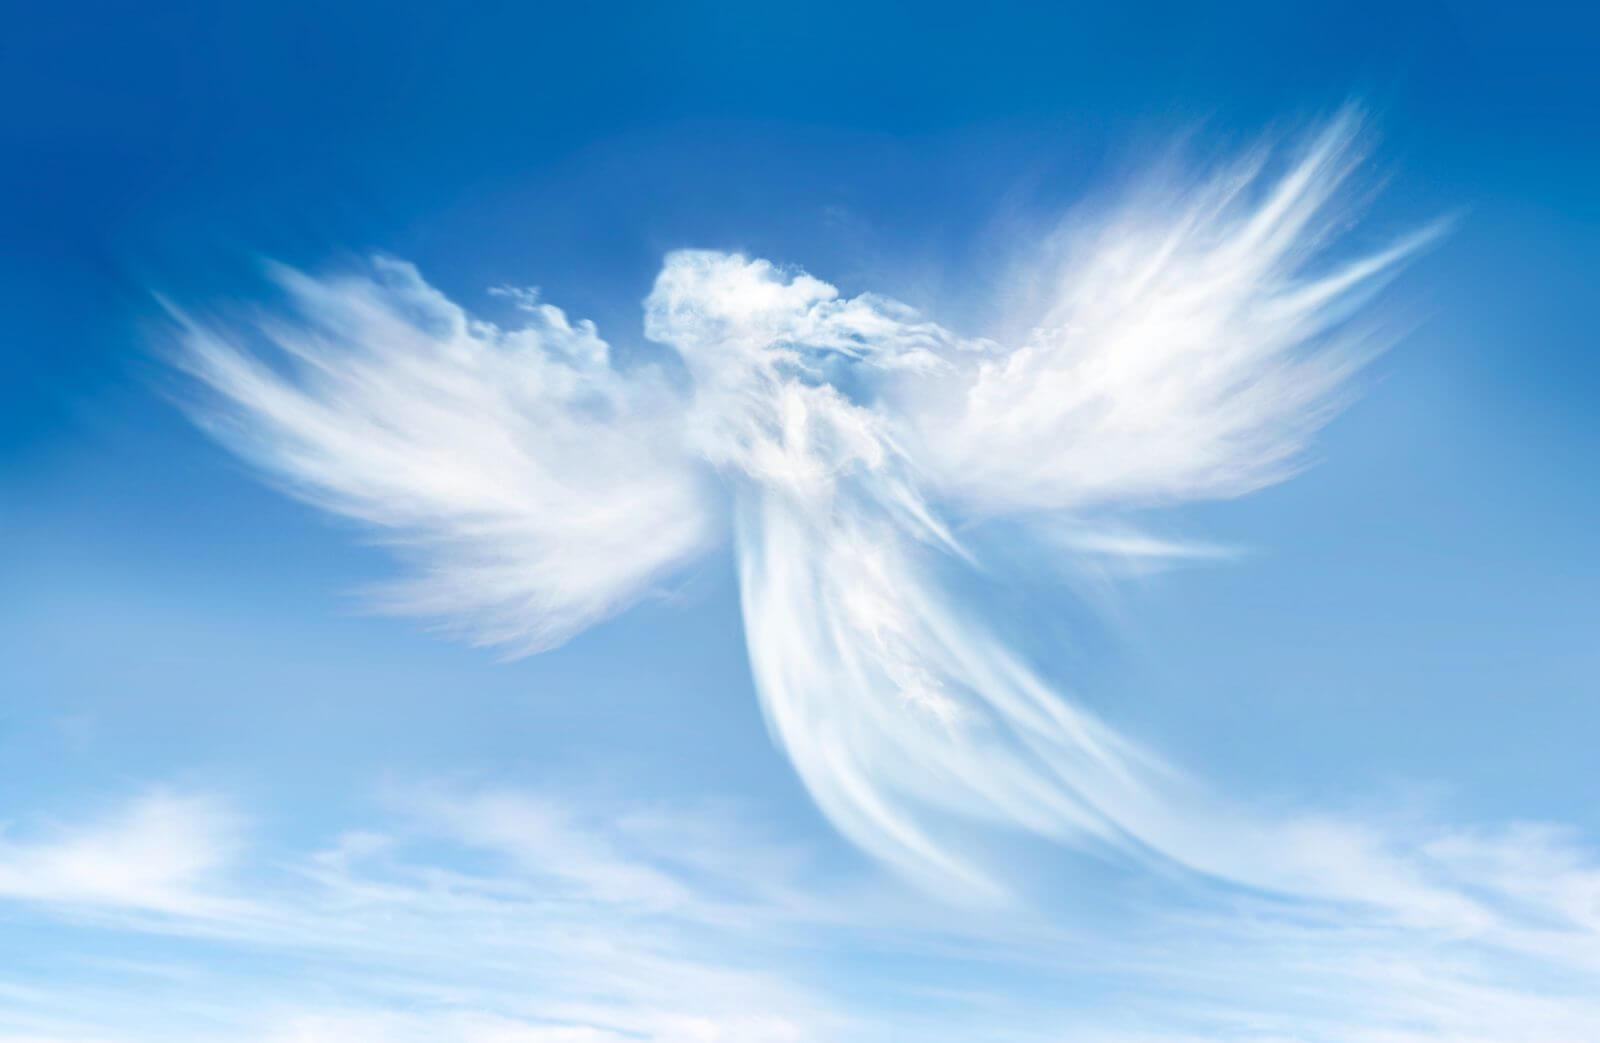 ángel y horóscopo